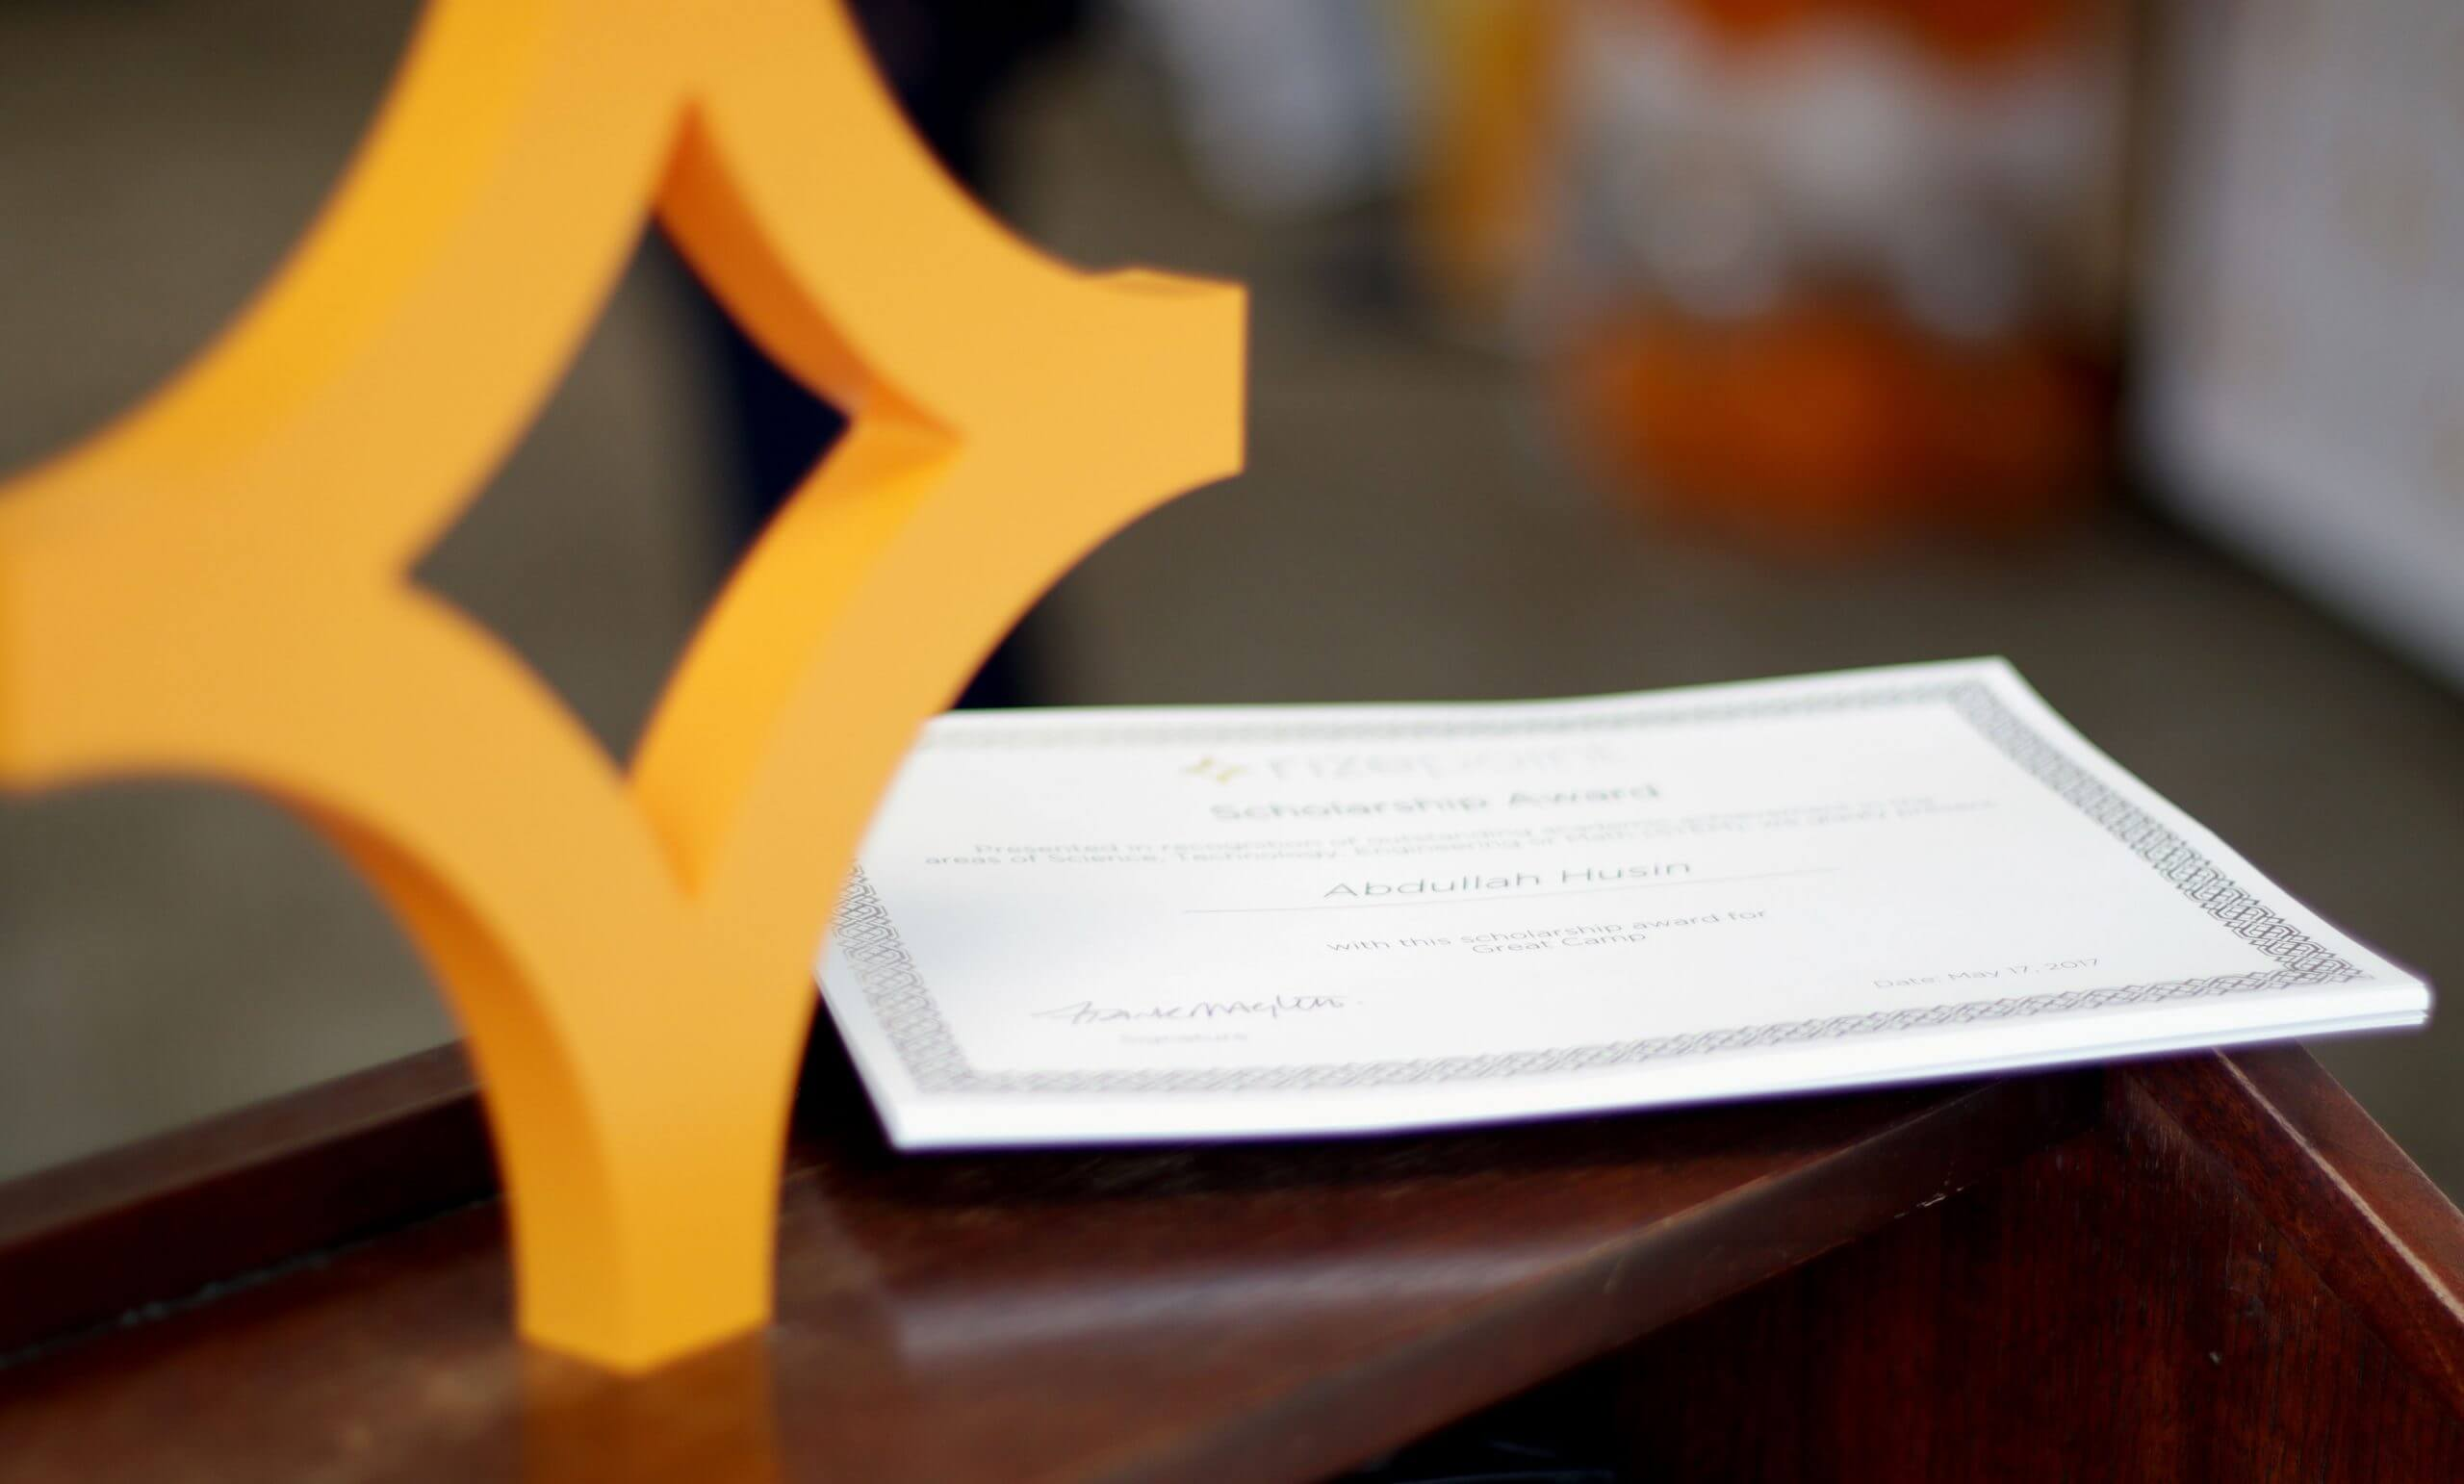 RizePoint Wins Apex Award for STEM Programs